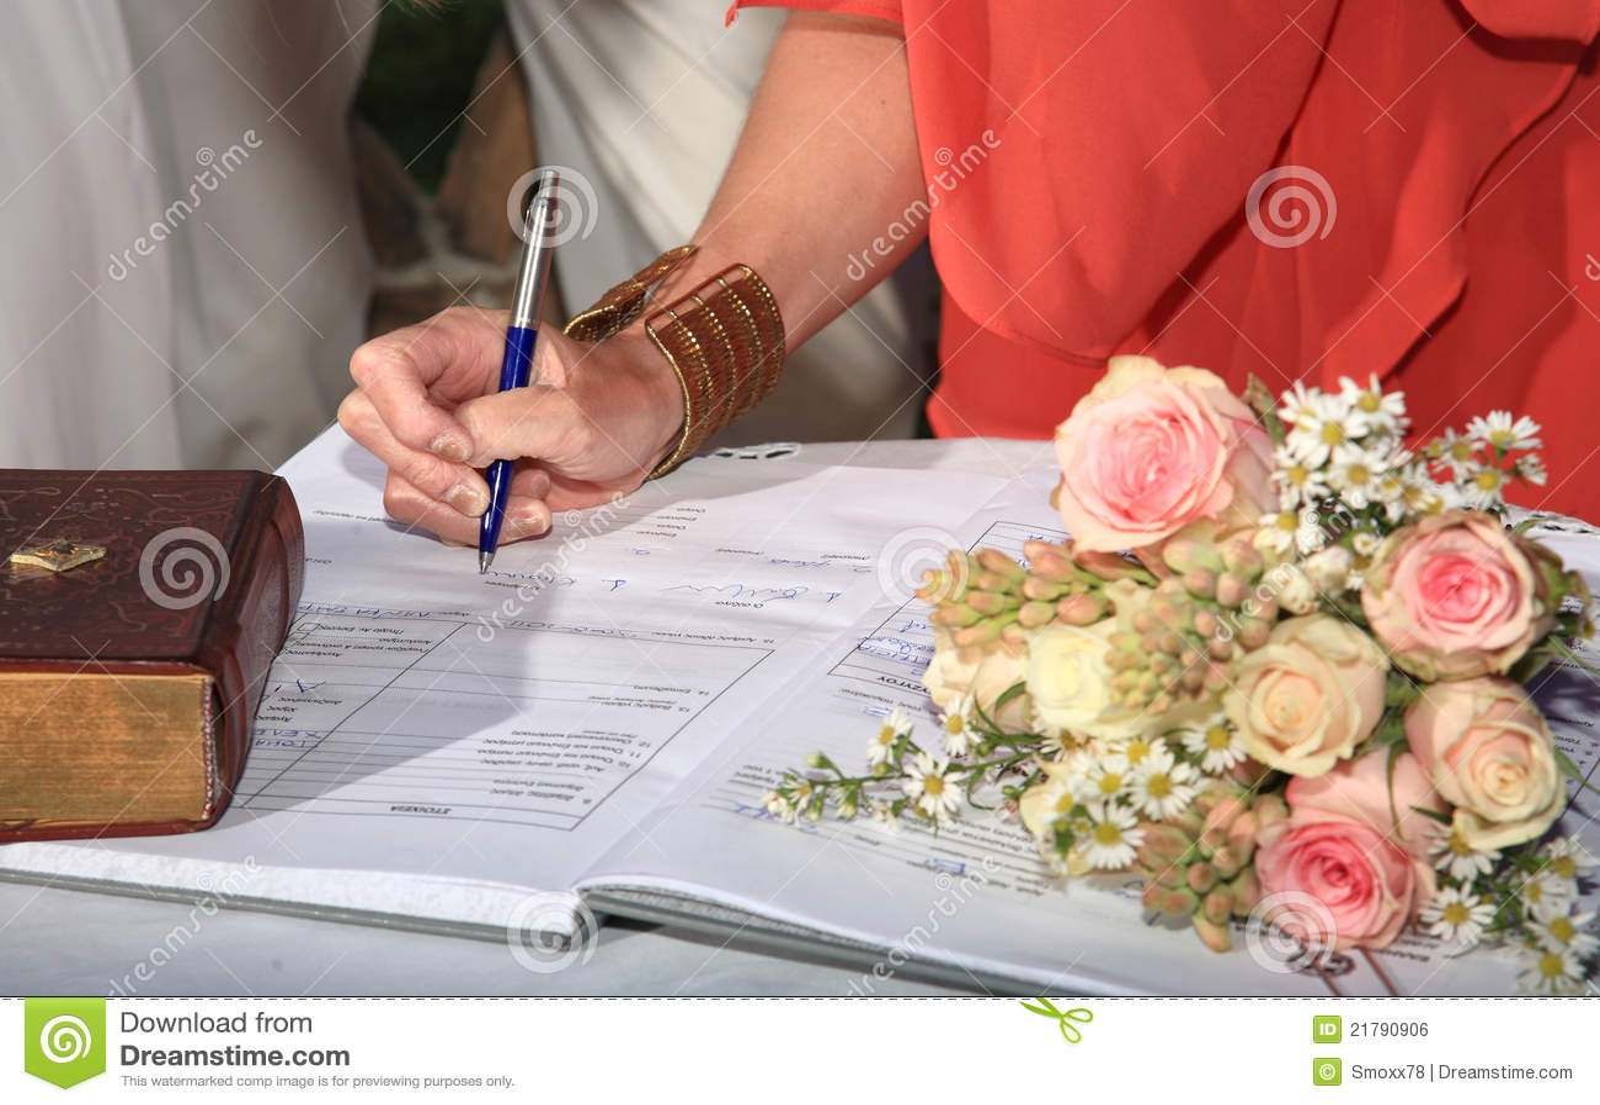 Jewish Wedding Vows and Ring Ceremony – Kiddushin